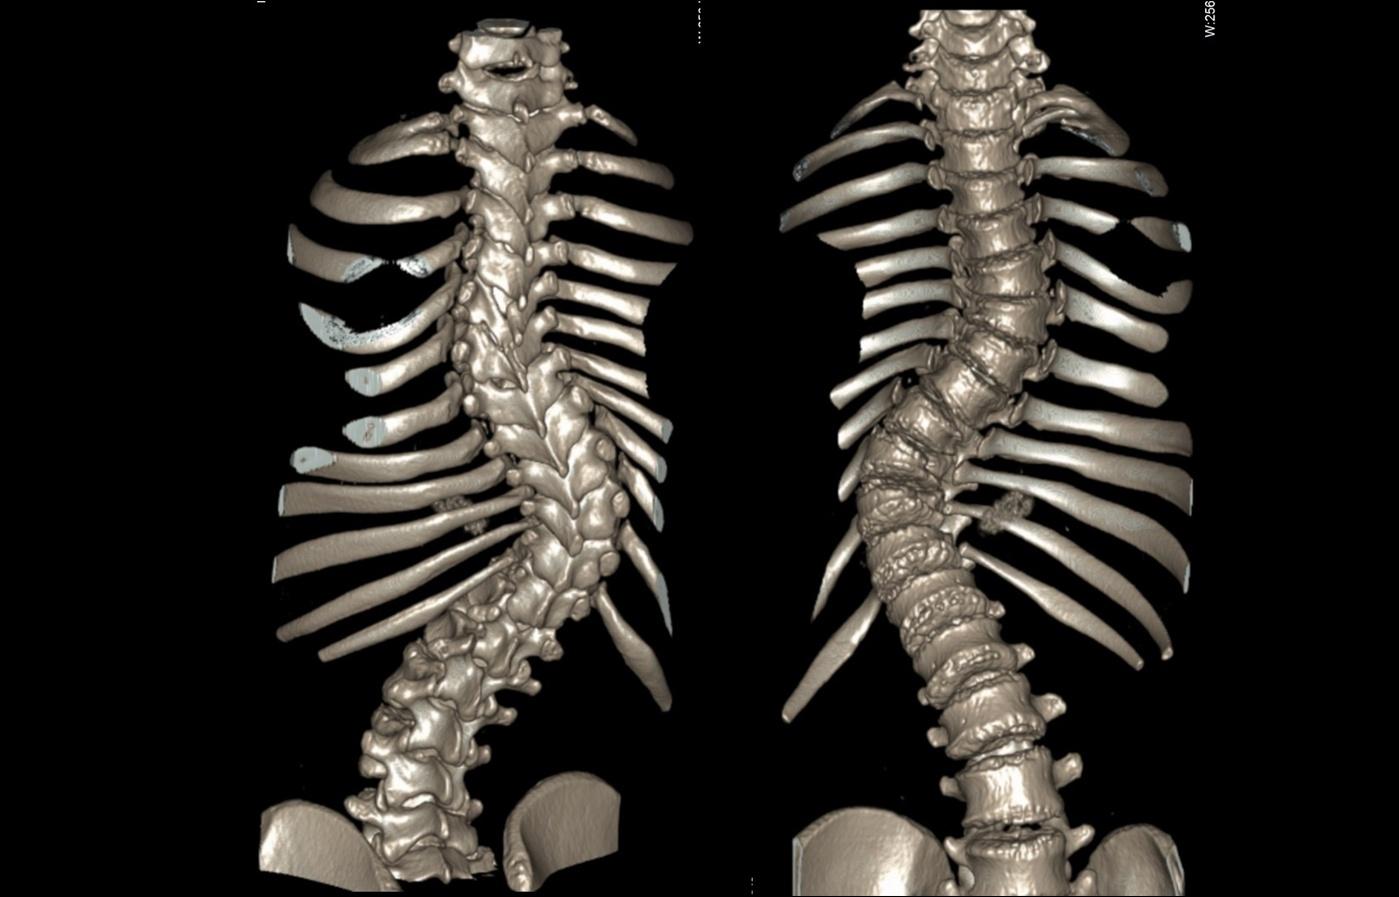 ct_slide_spine_3d_2-01.jpg